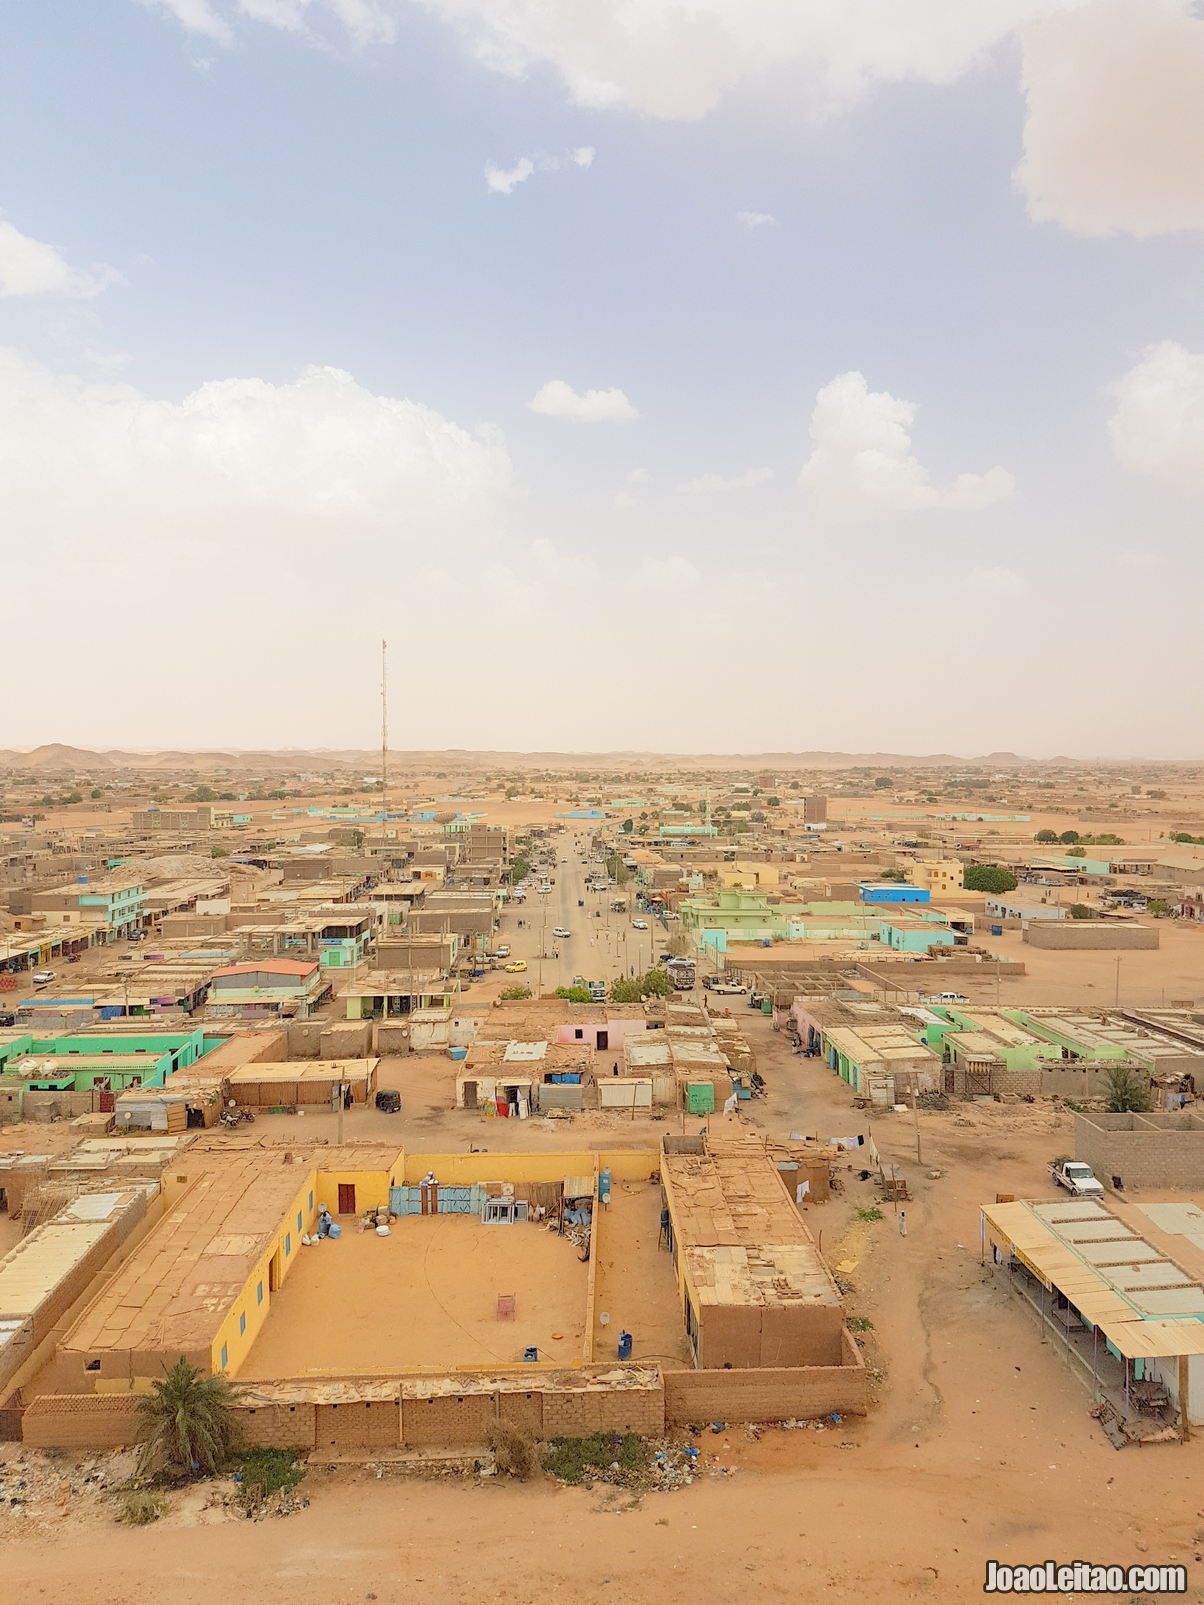 Visit Wadi Halfa